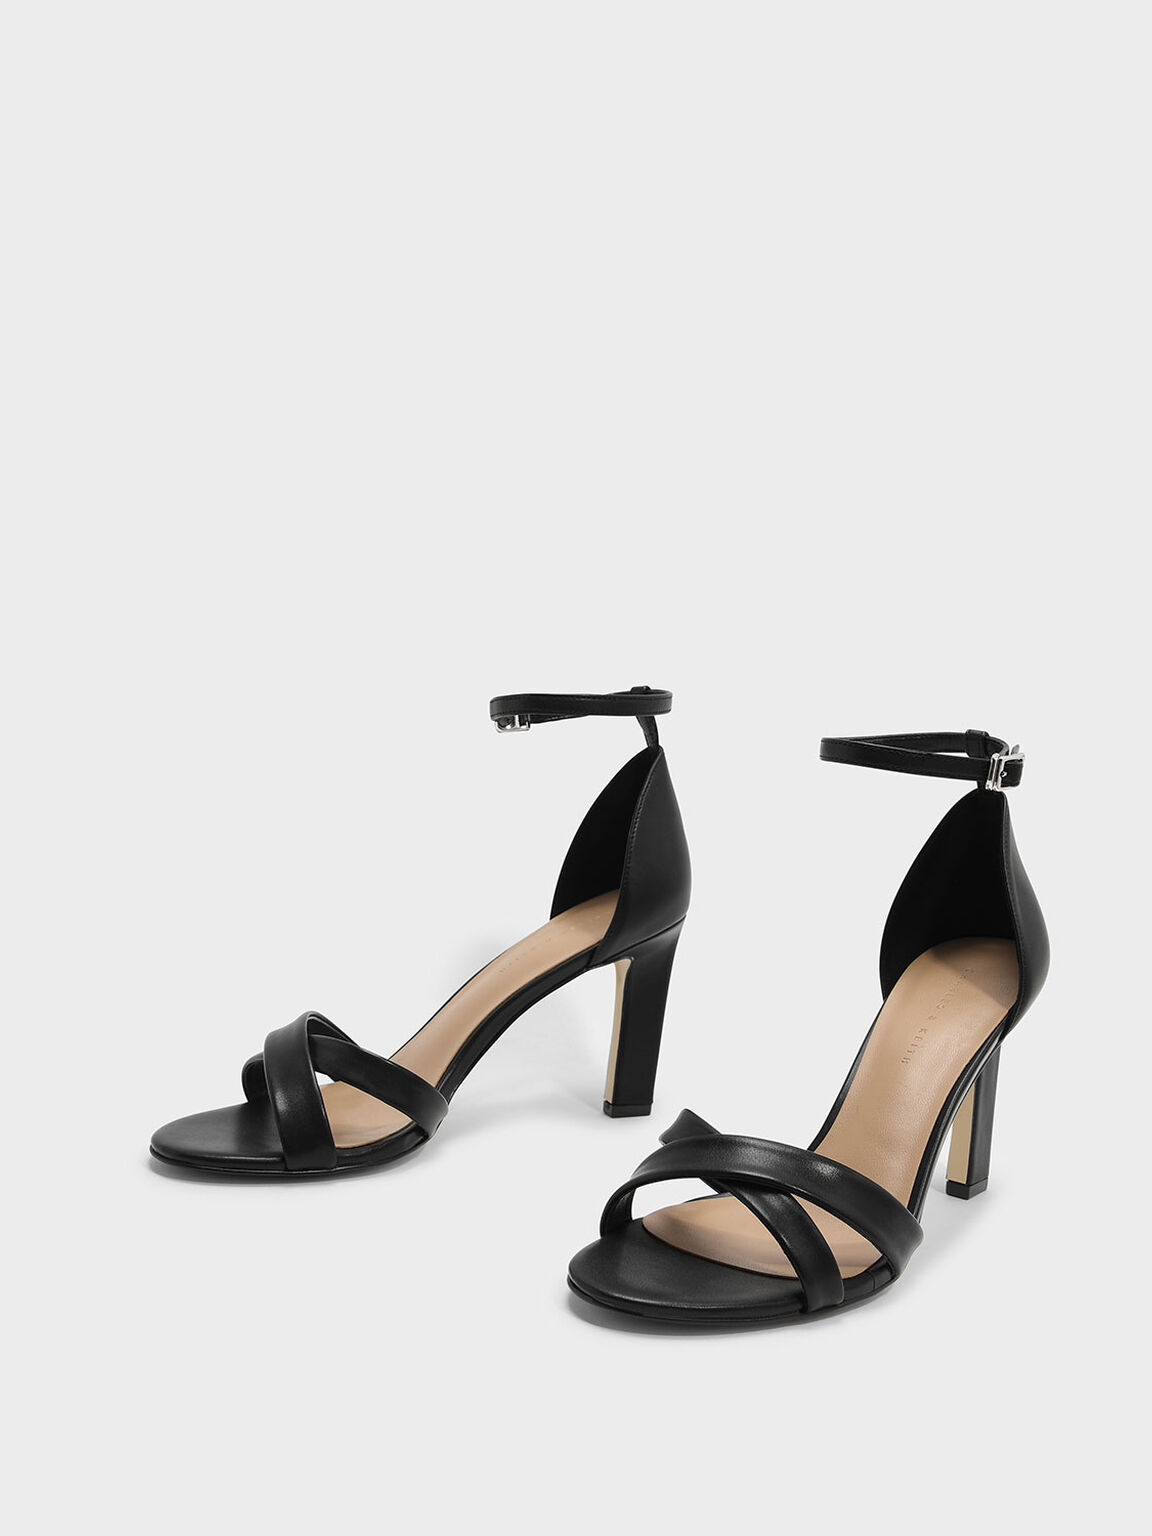 Ankle Strap Criss Cross Heeled Sandals, Black, hi-res